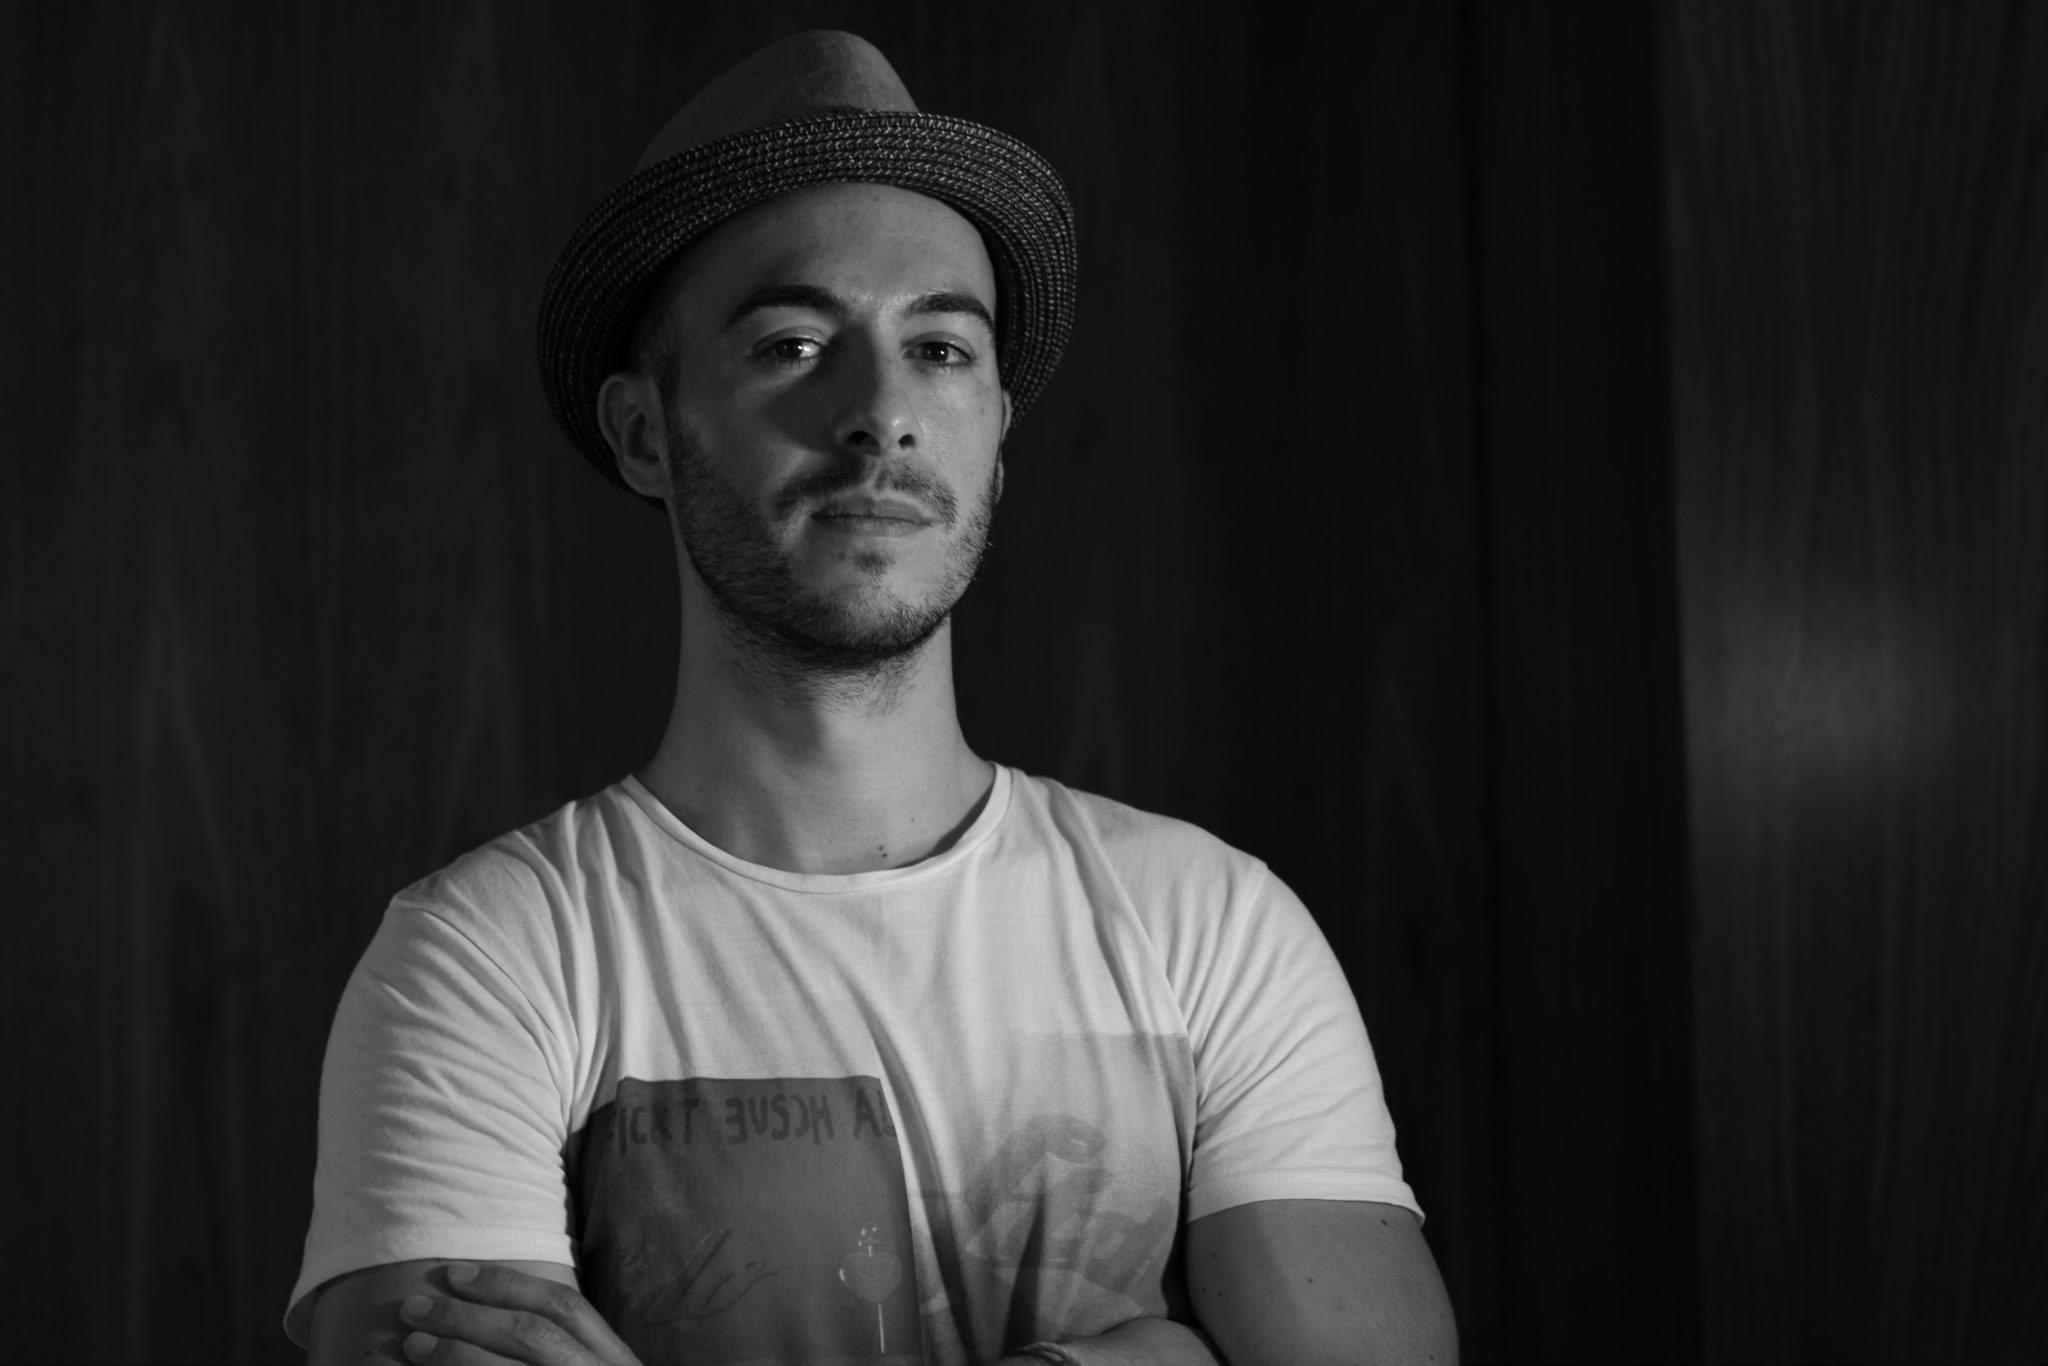 Paul James Driscoll, Director of Photography at Mandolin Media